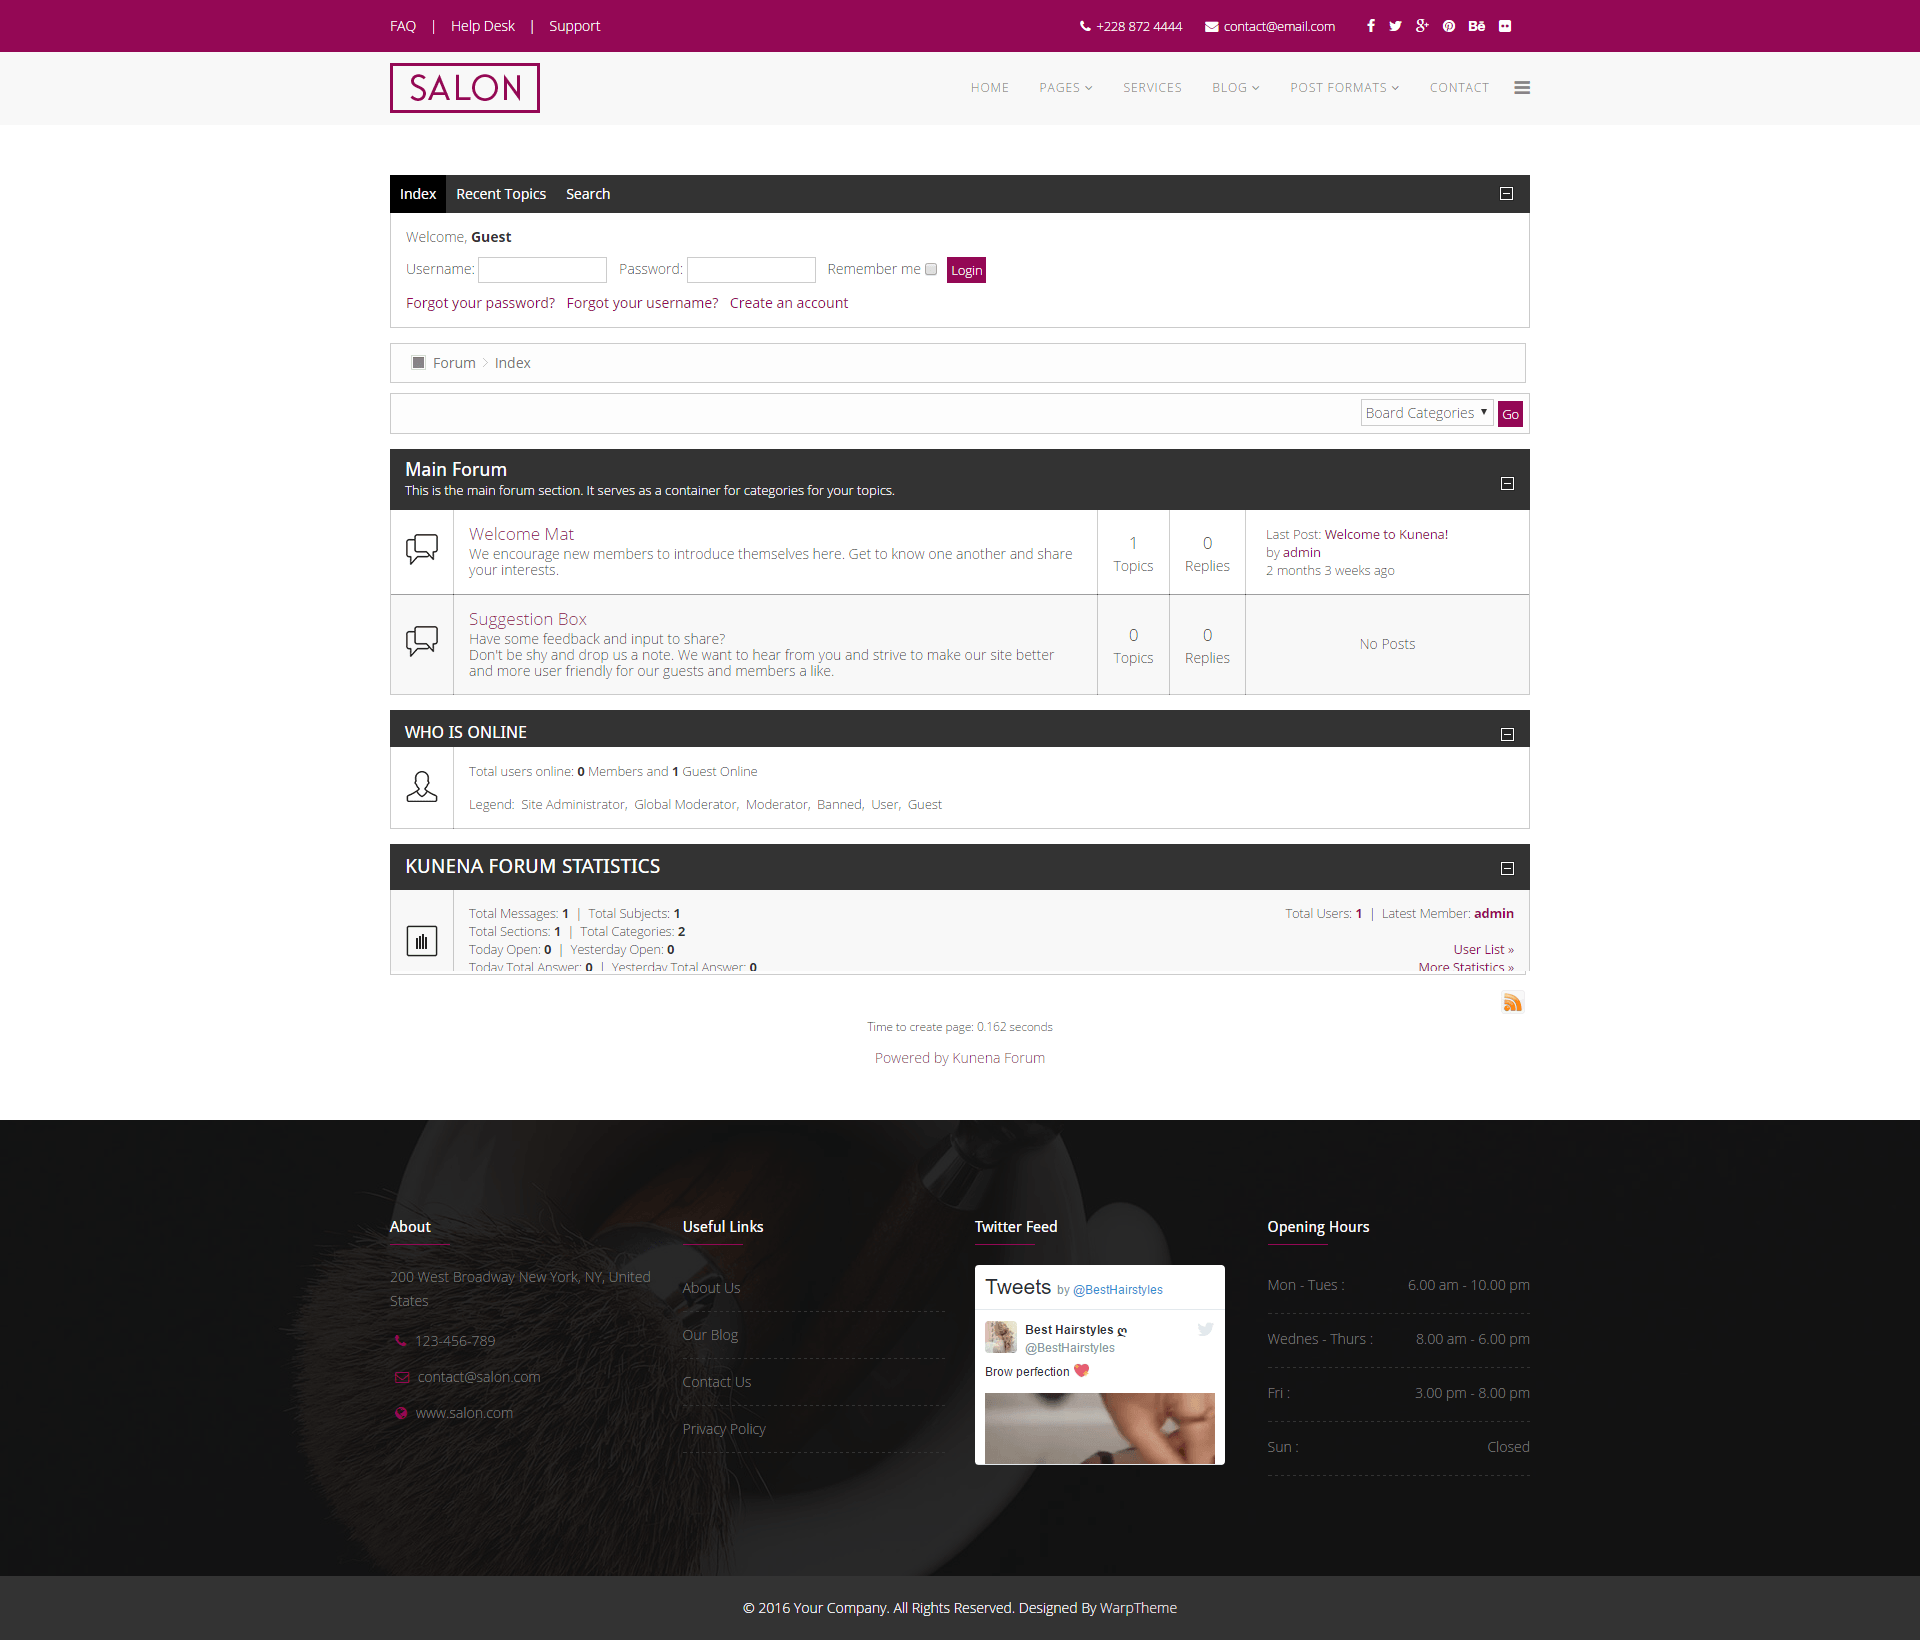 kunena-forum